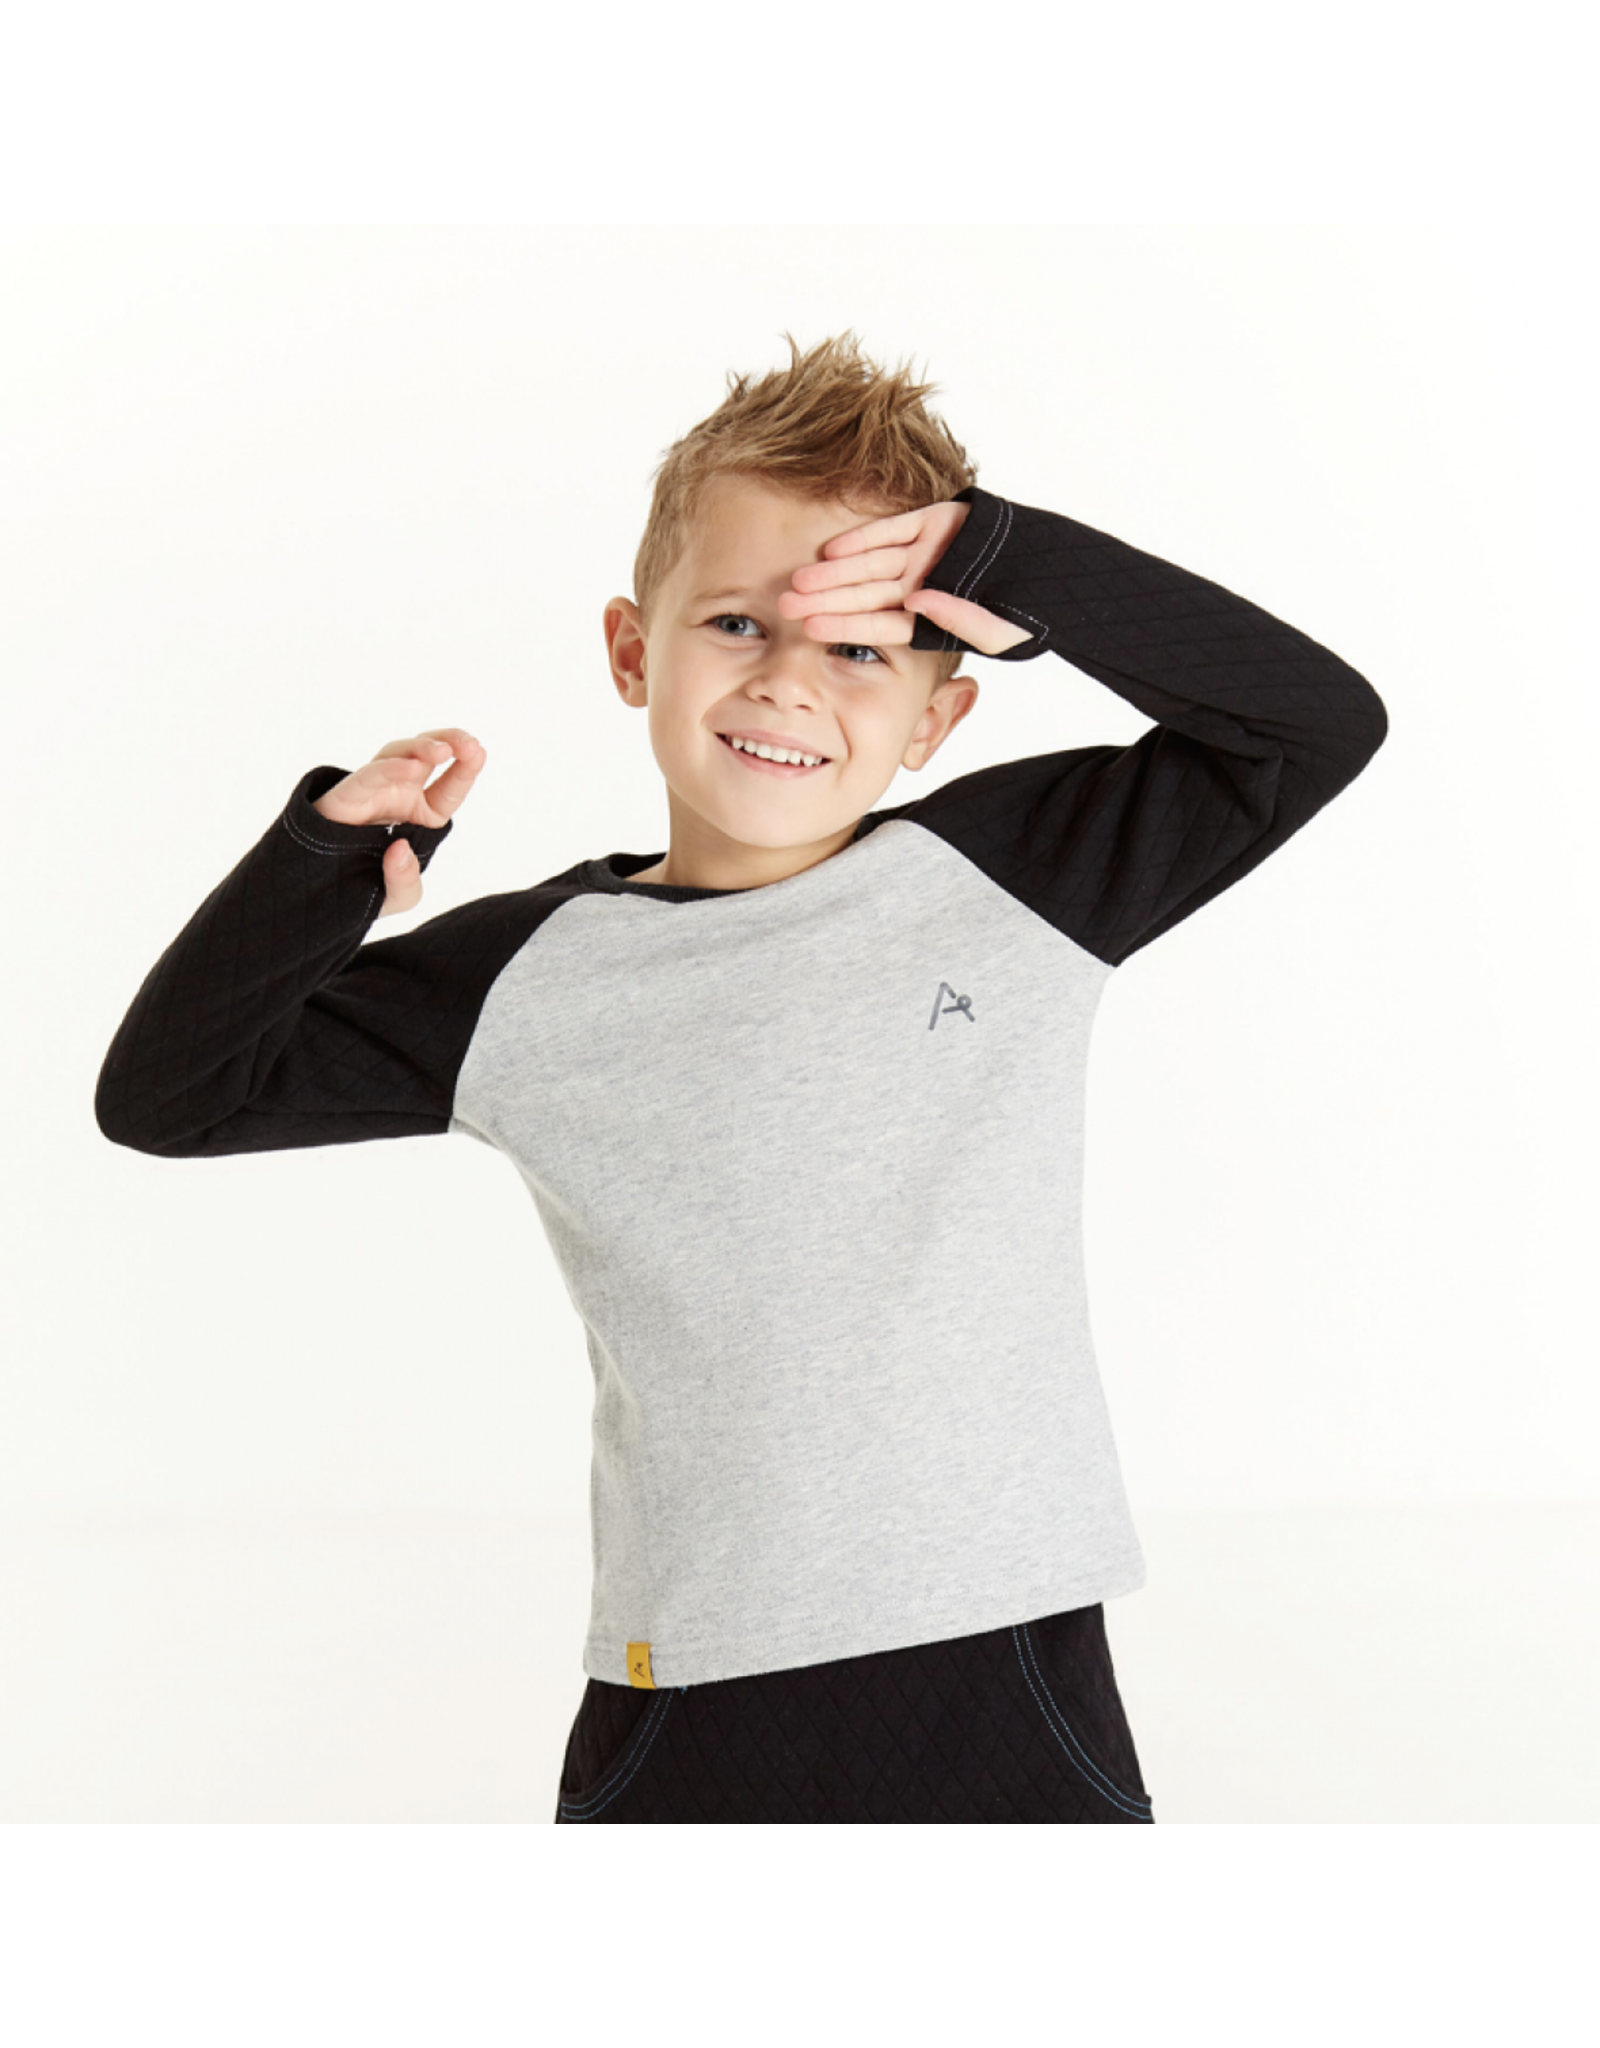 Albababy Alba children's shirt - hollow blouse